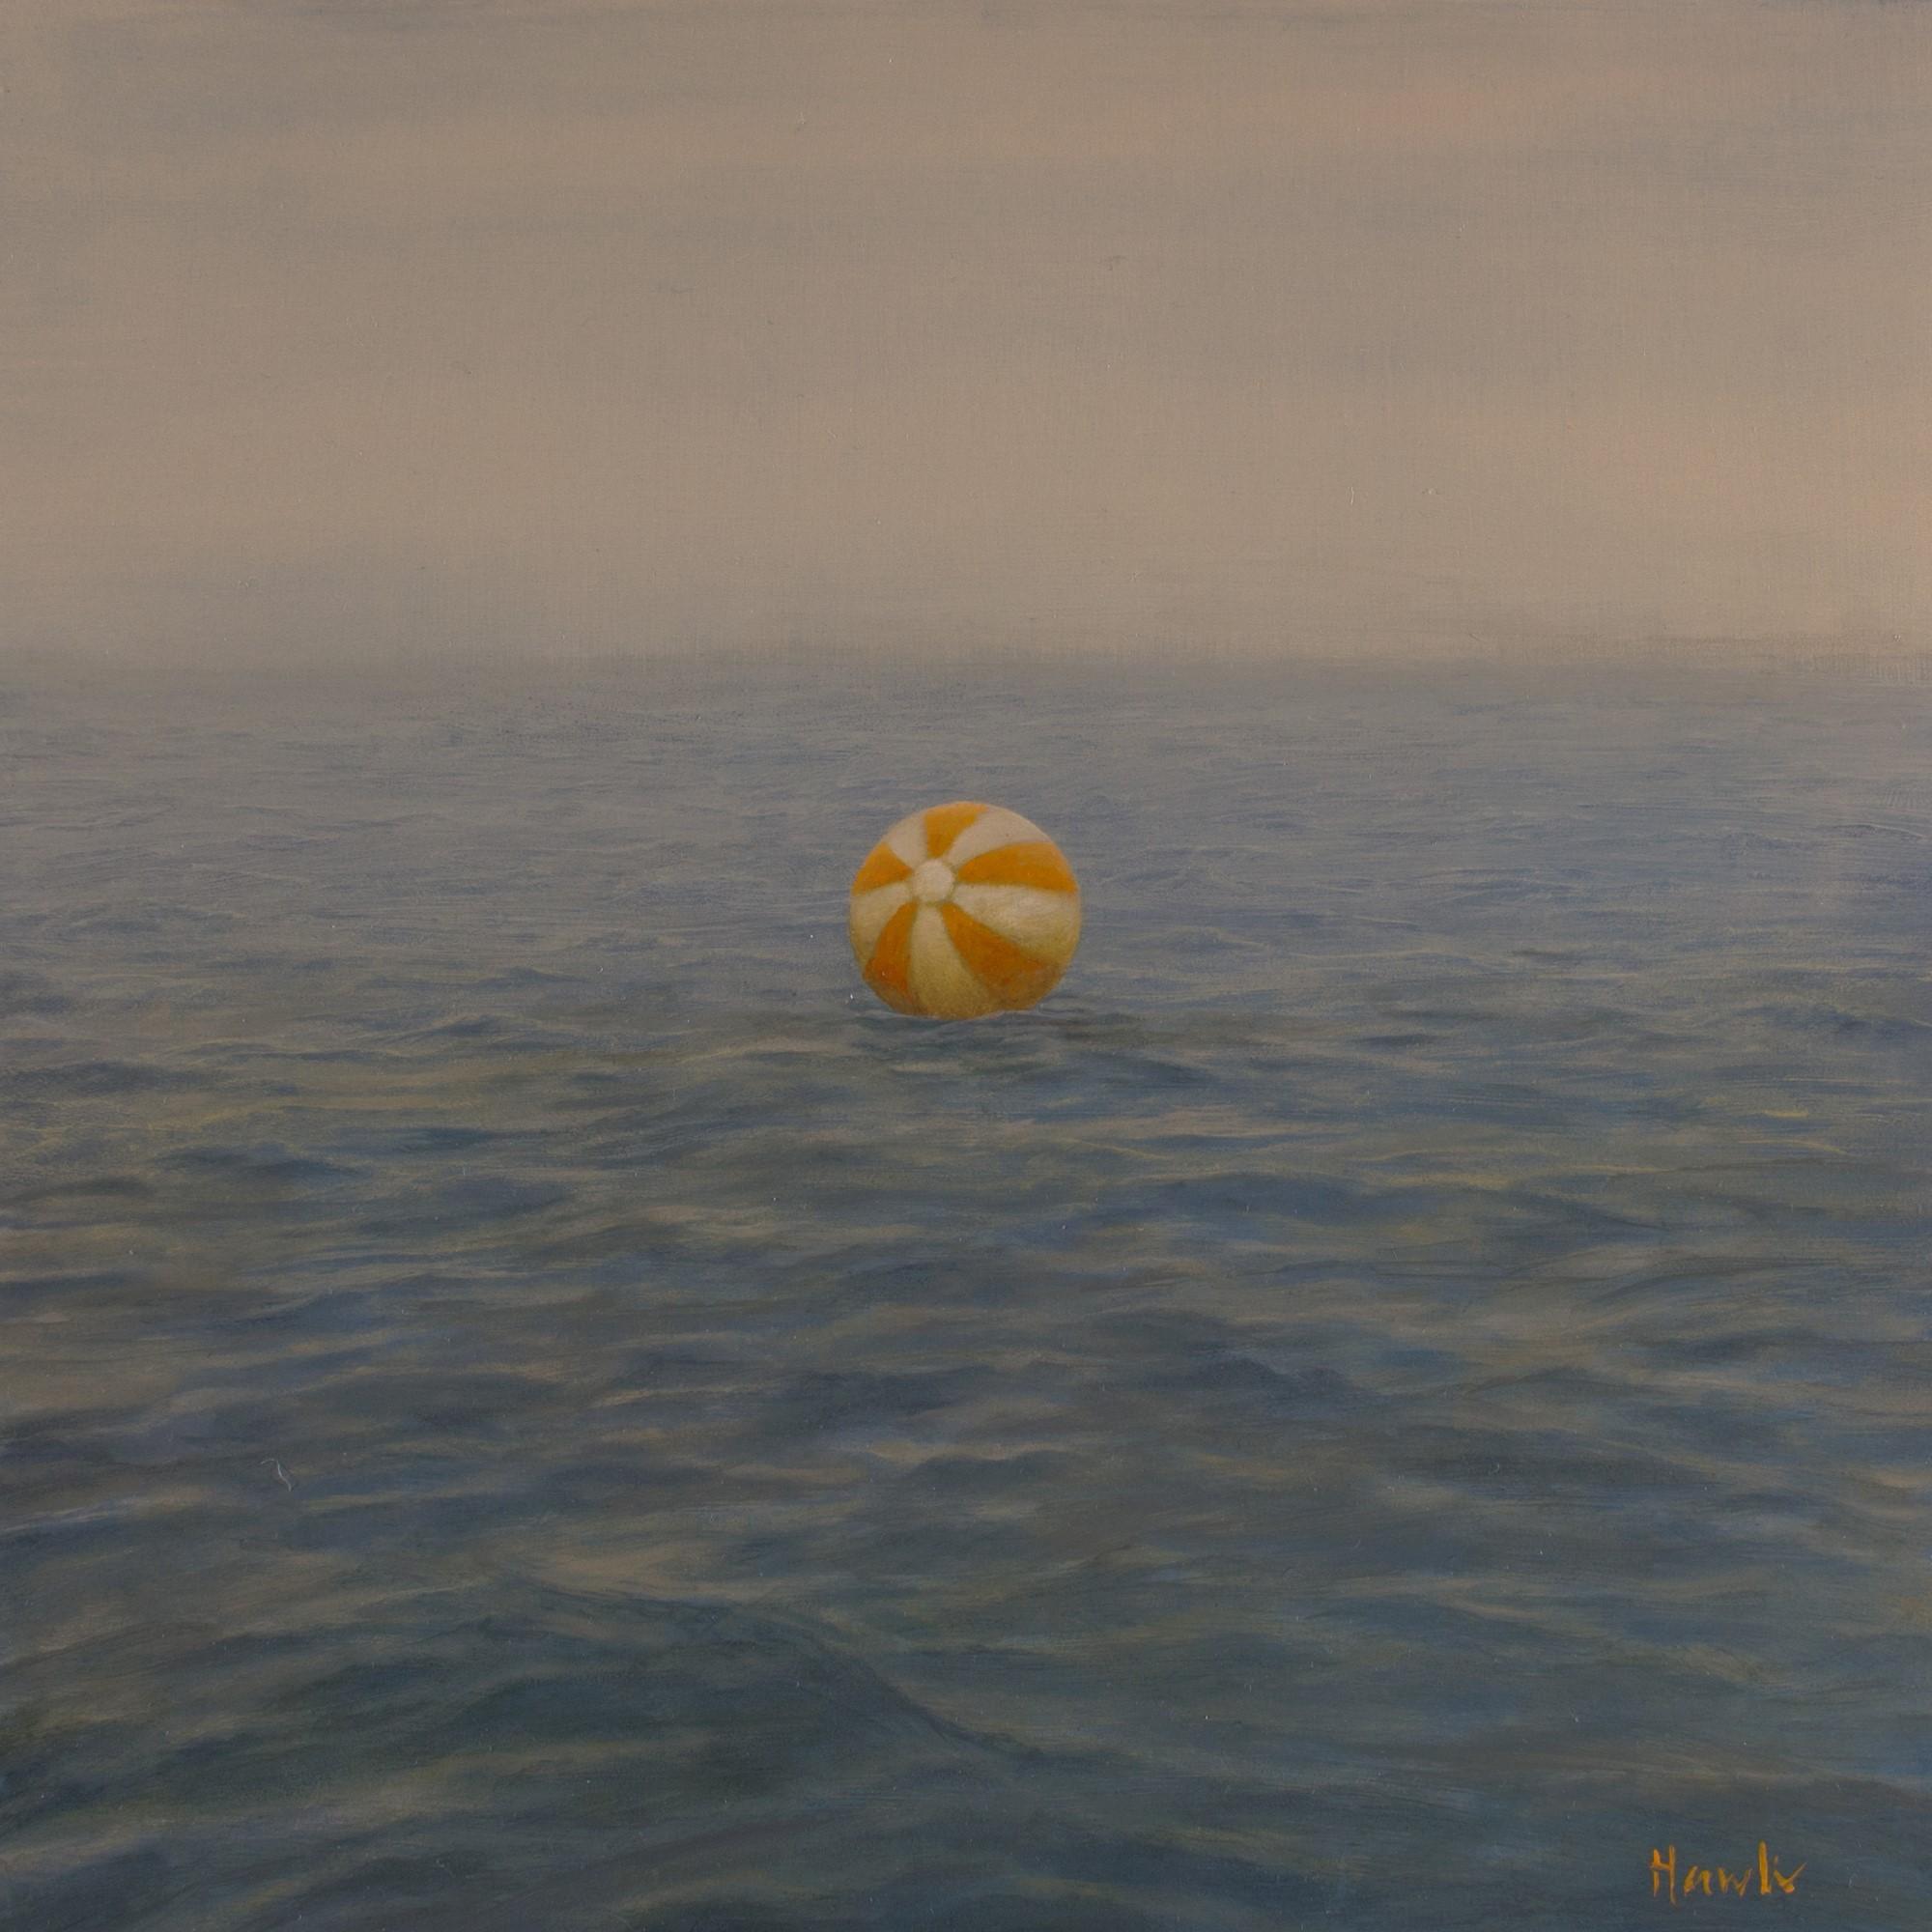 Somewhat Lost by Dana Hawk